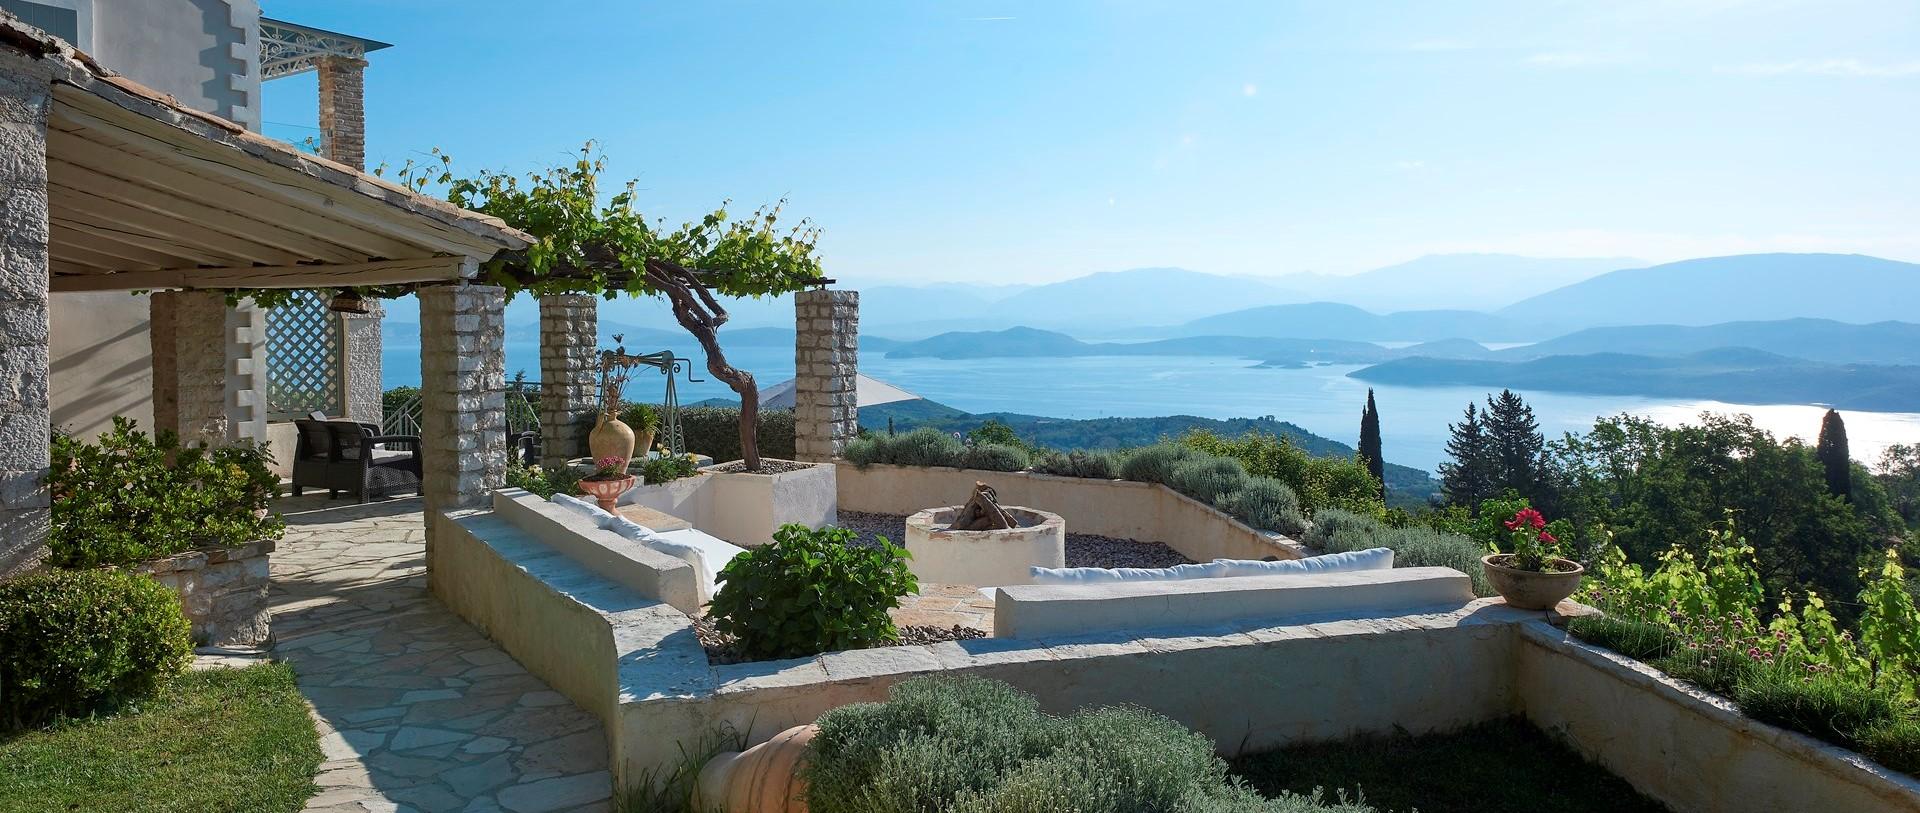 villa-kokkini-corfu-garden-terrace